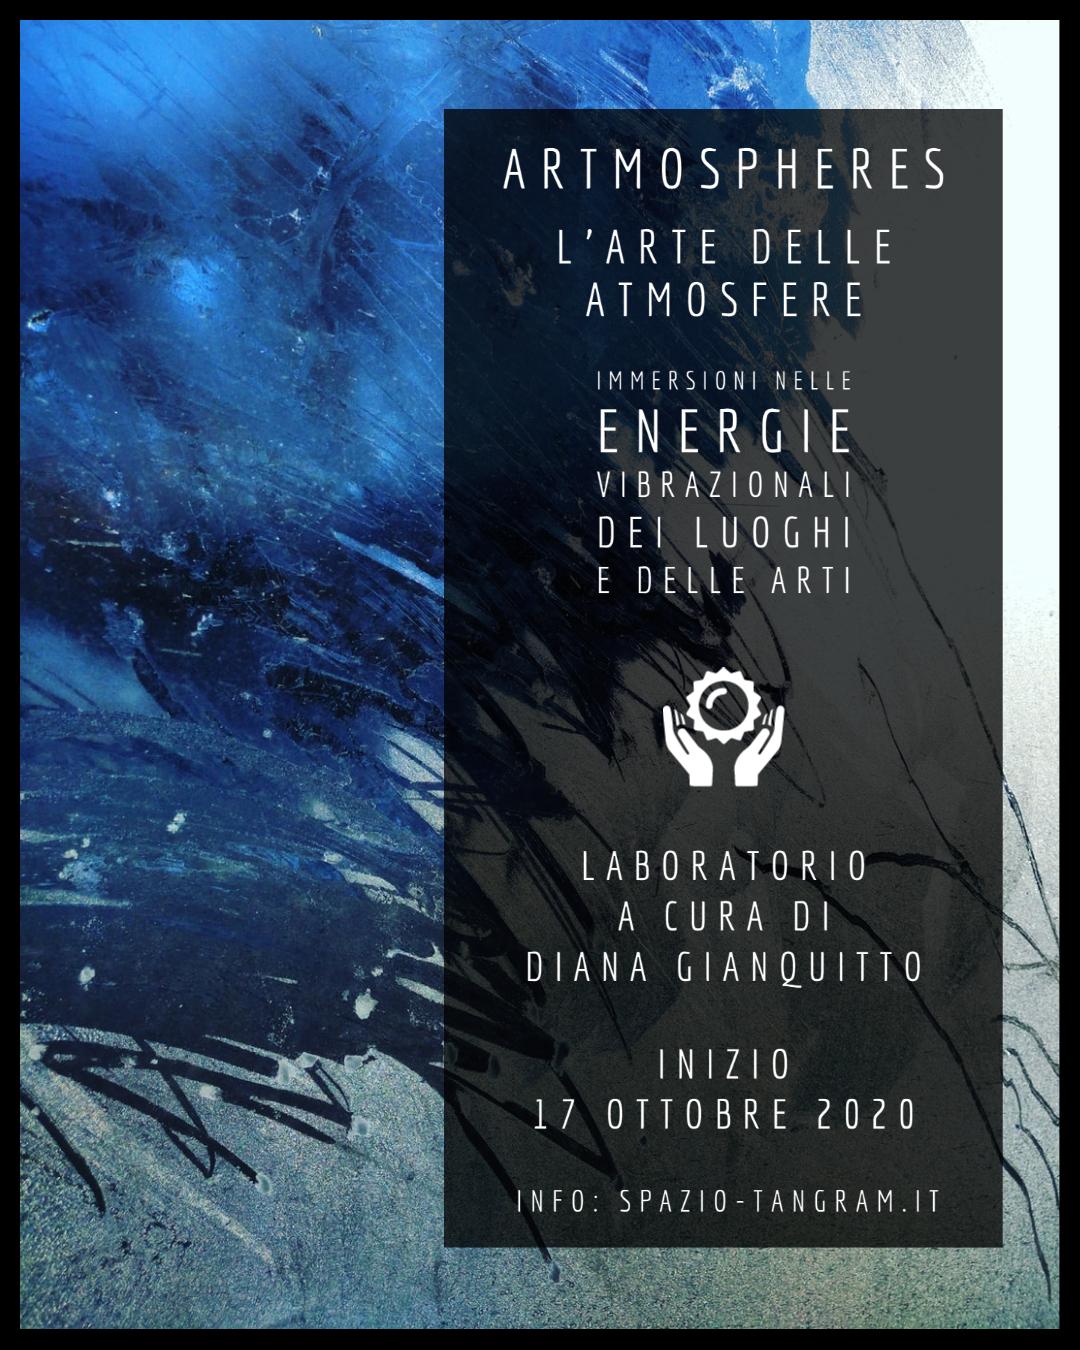 Artmospheres | l'arte delle atmosfere